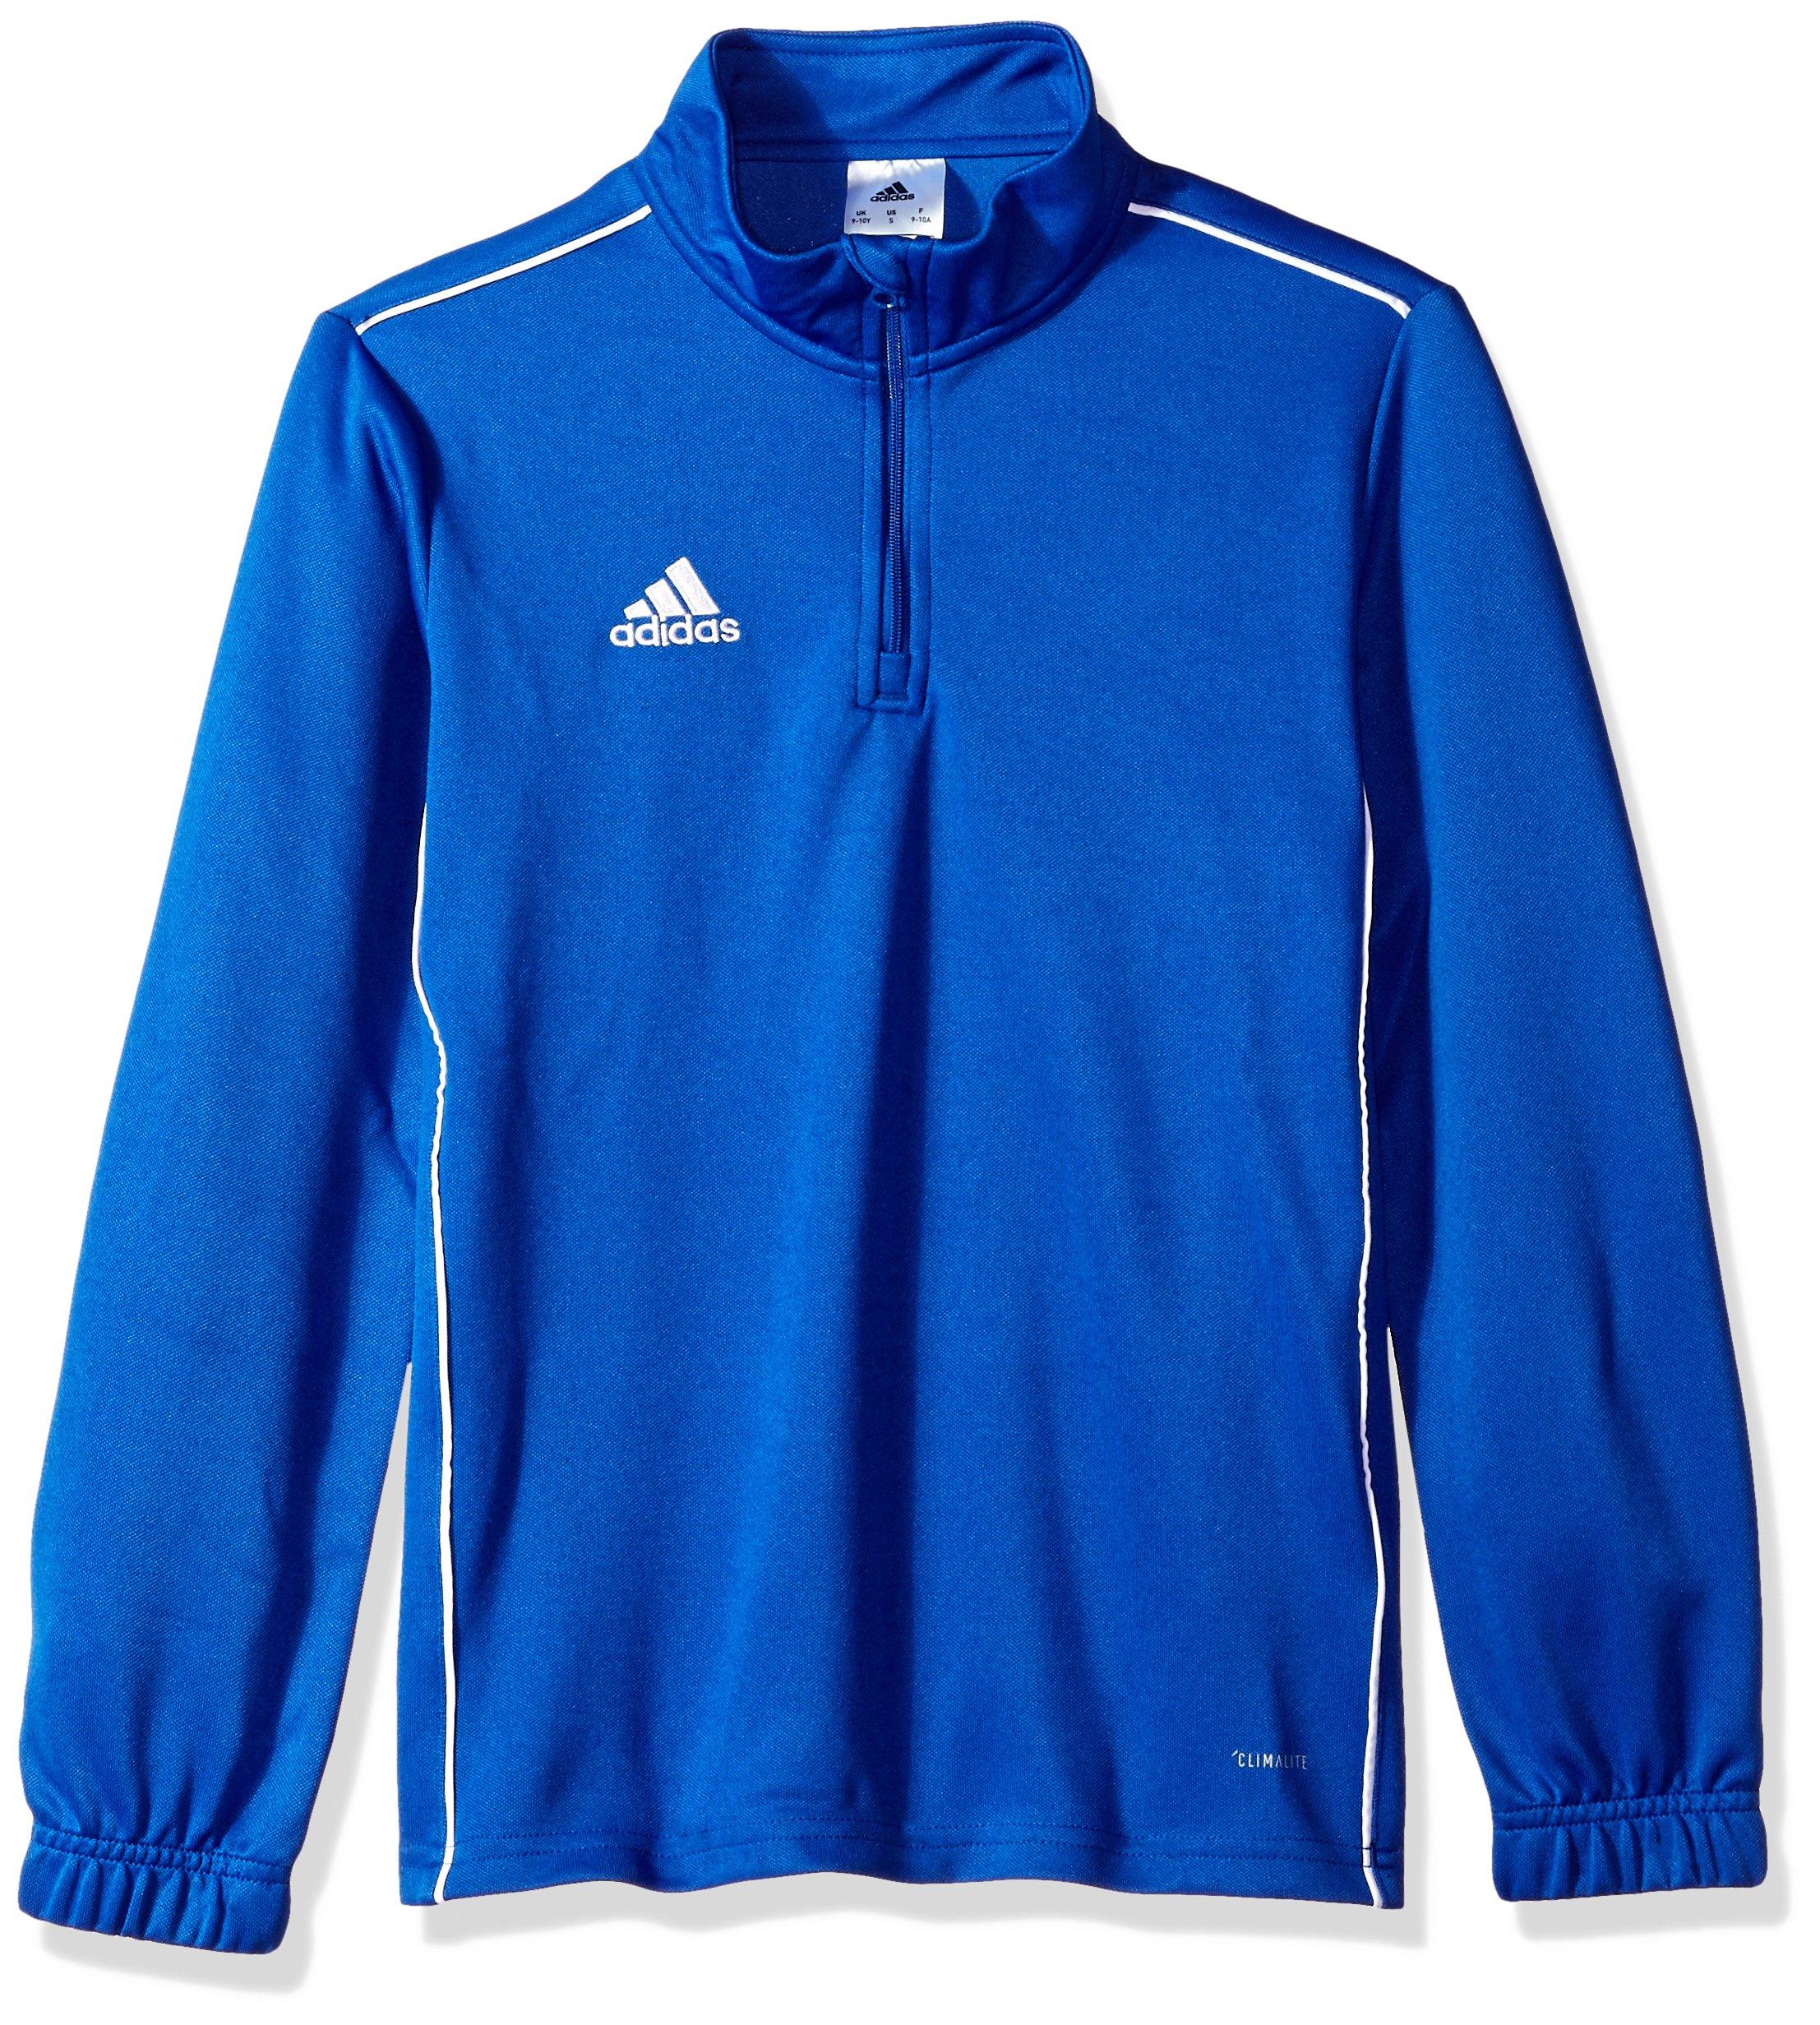 adidas Juniors' Core 18 Soccer Training Sweatshirt, Bold Blue/White, X-Small